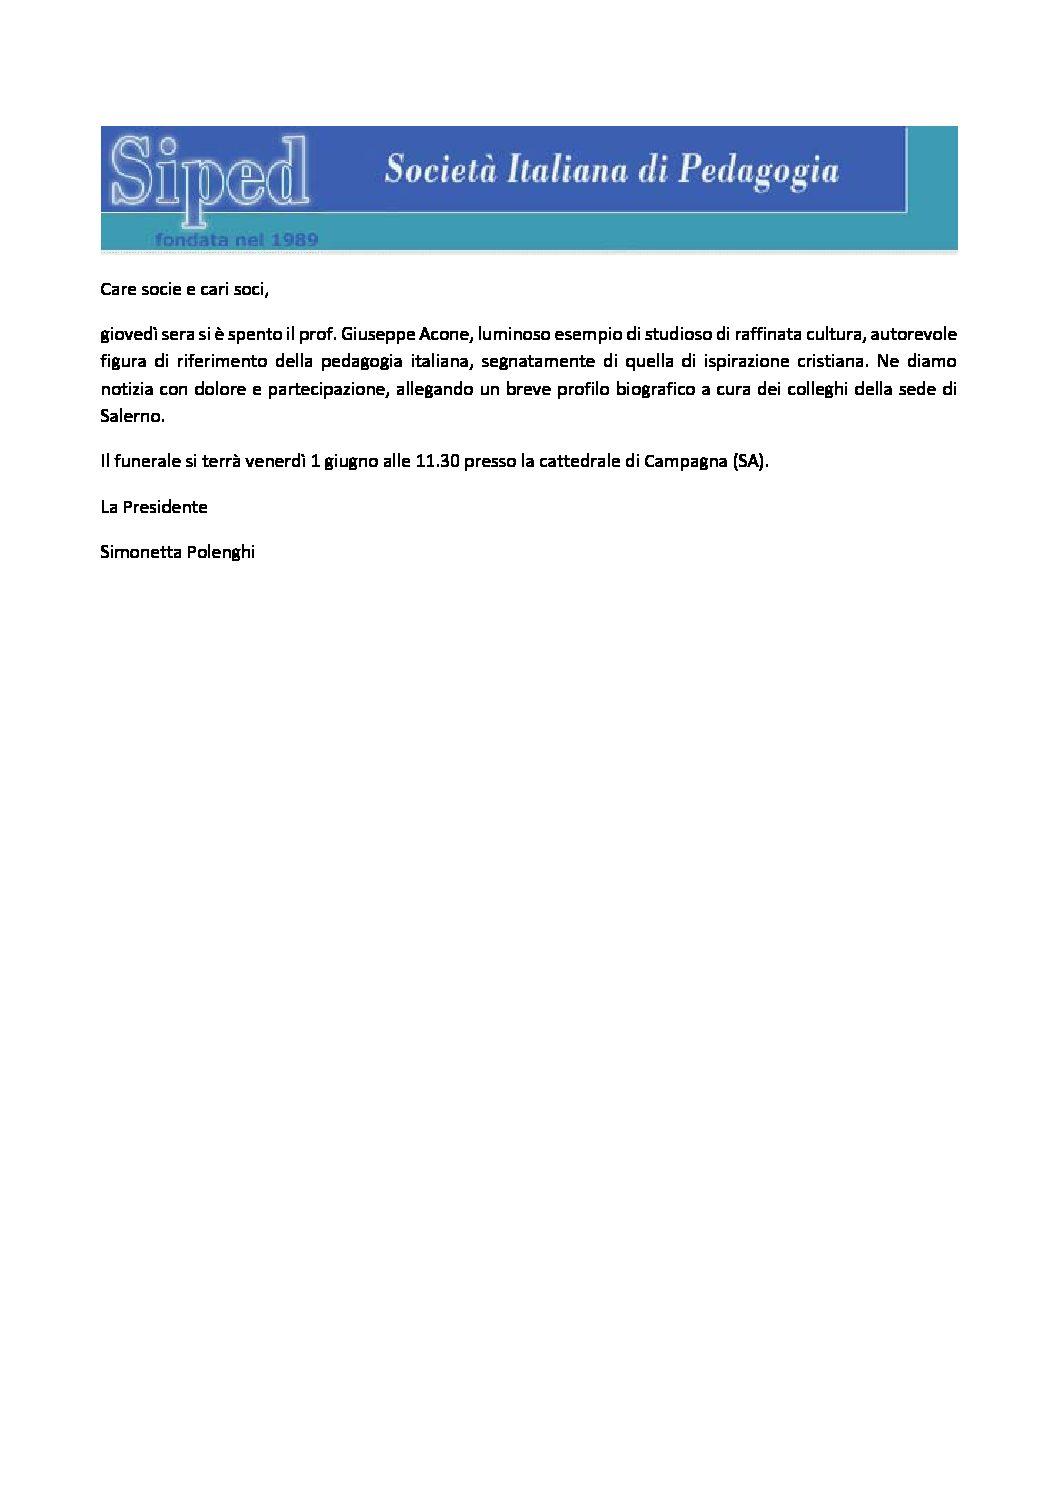 2018.05.31 – Scomparsa prof. Giuseppe Acone